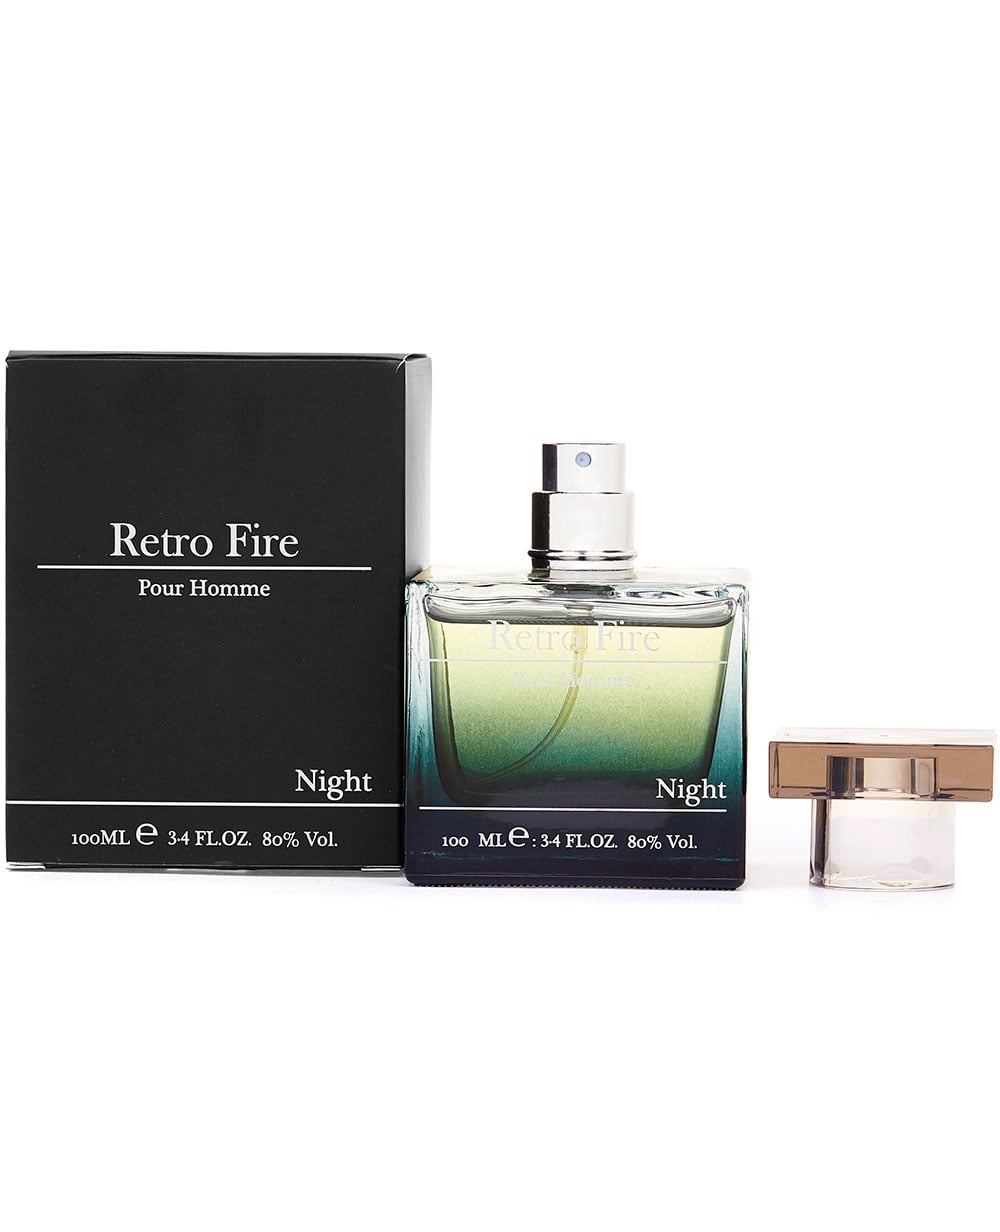 retro fire mens night 100ml aftershave eau de toilette masculine scents ebay. Black Bedroom Furniture Sets. Home Design Ideas